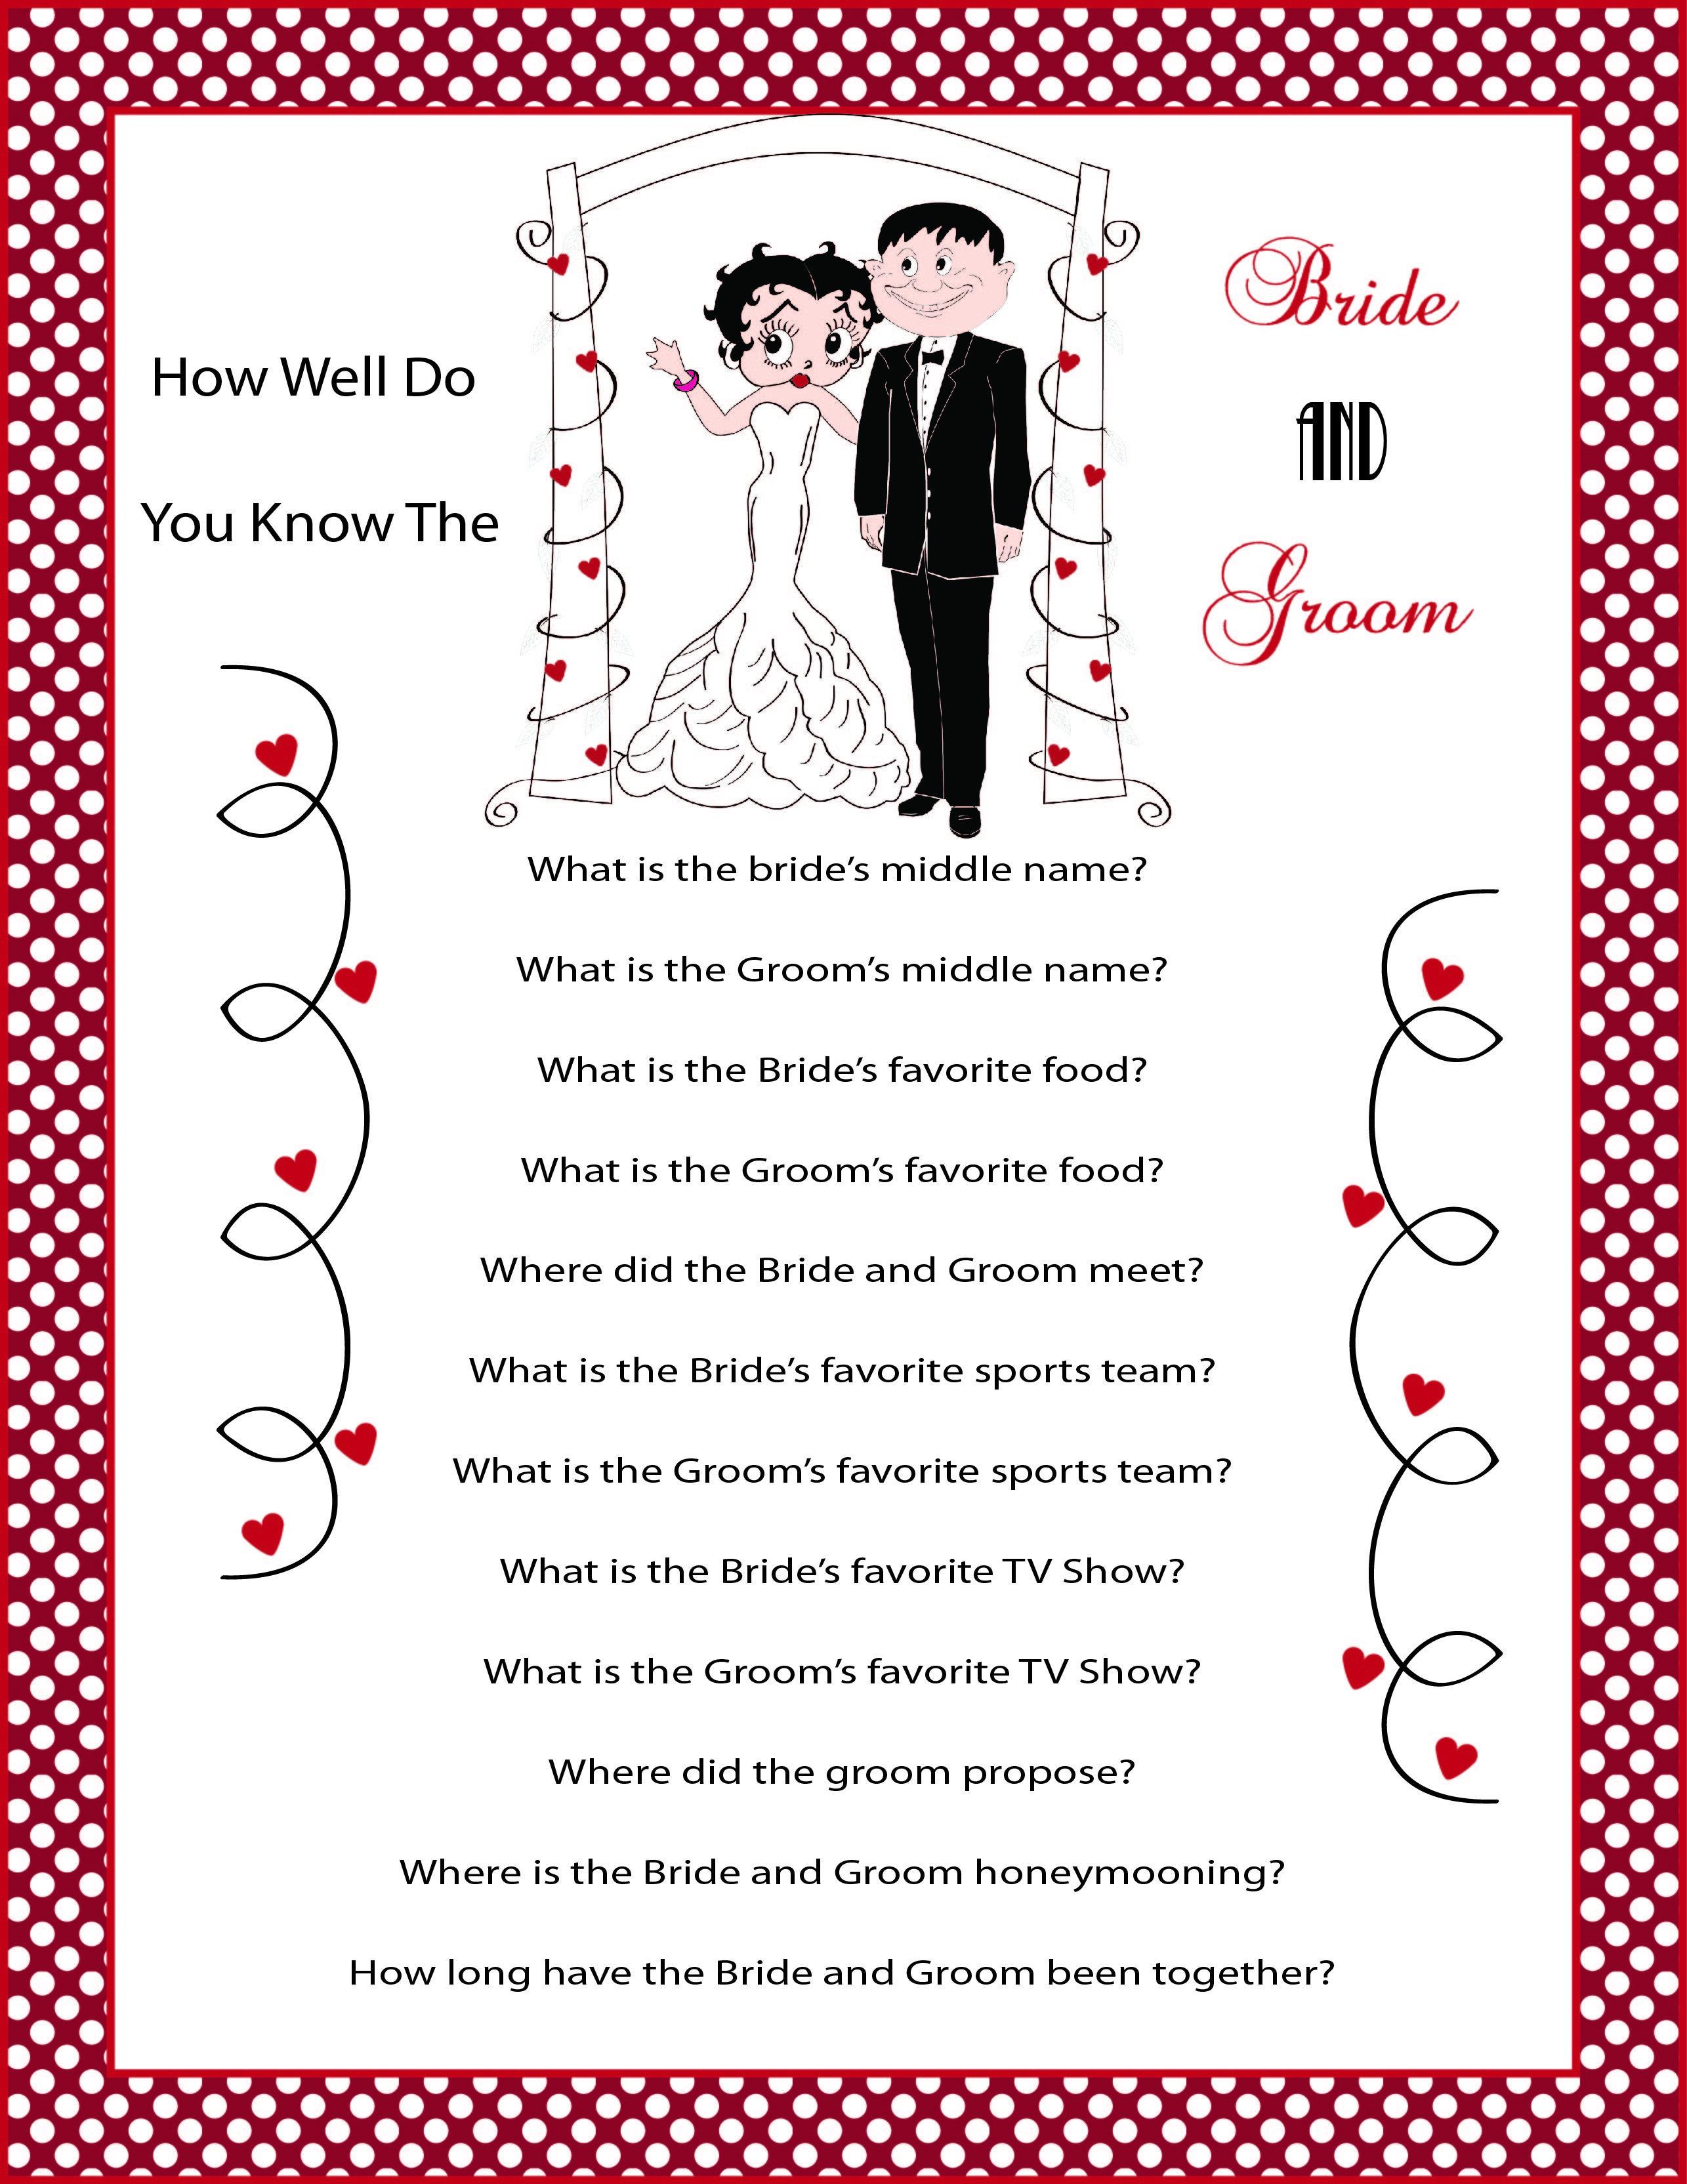 Betty boop and her man fun bridal or wedding shower game wedding